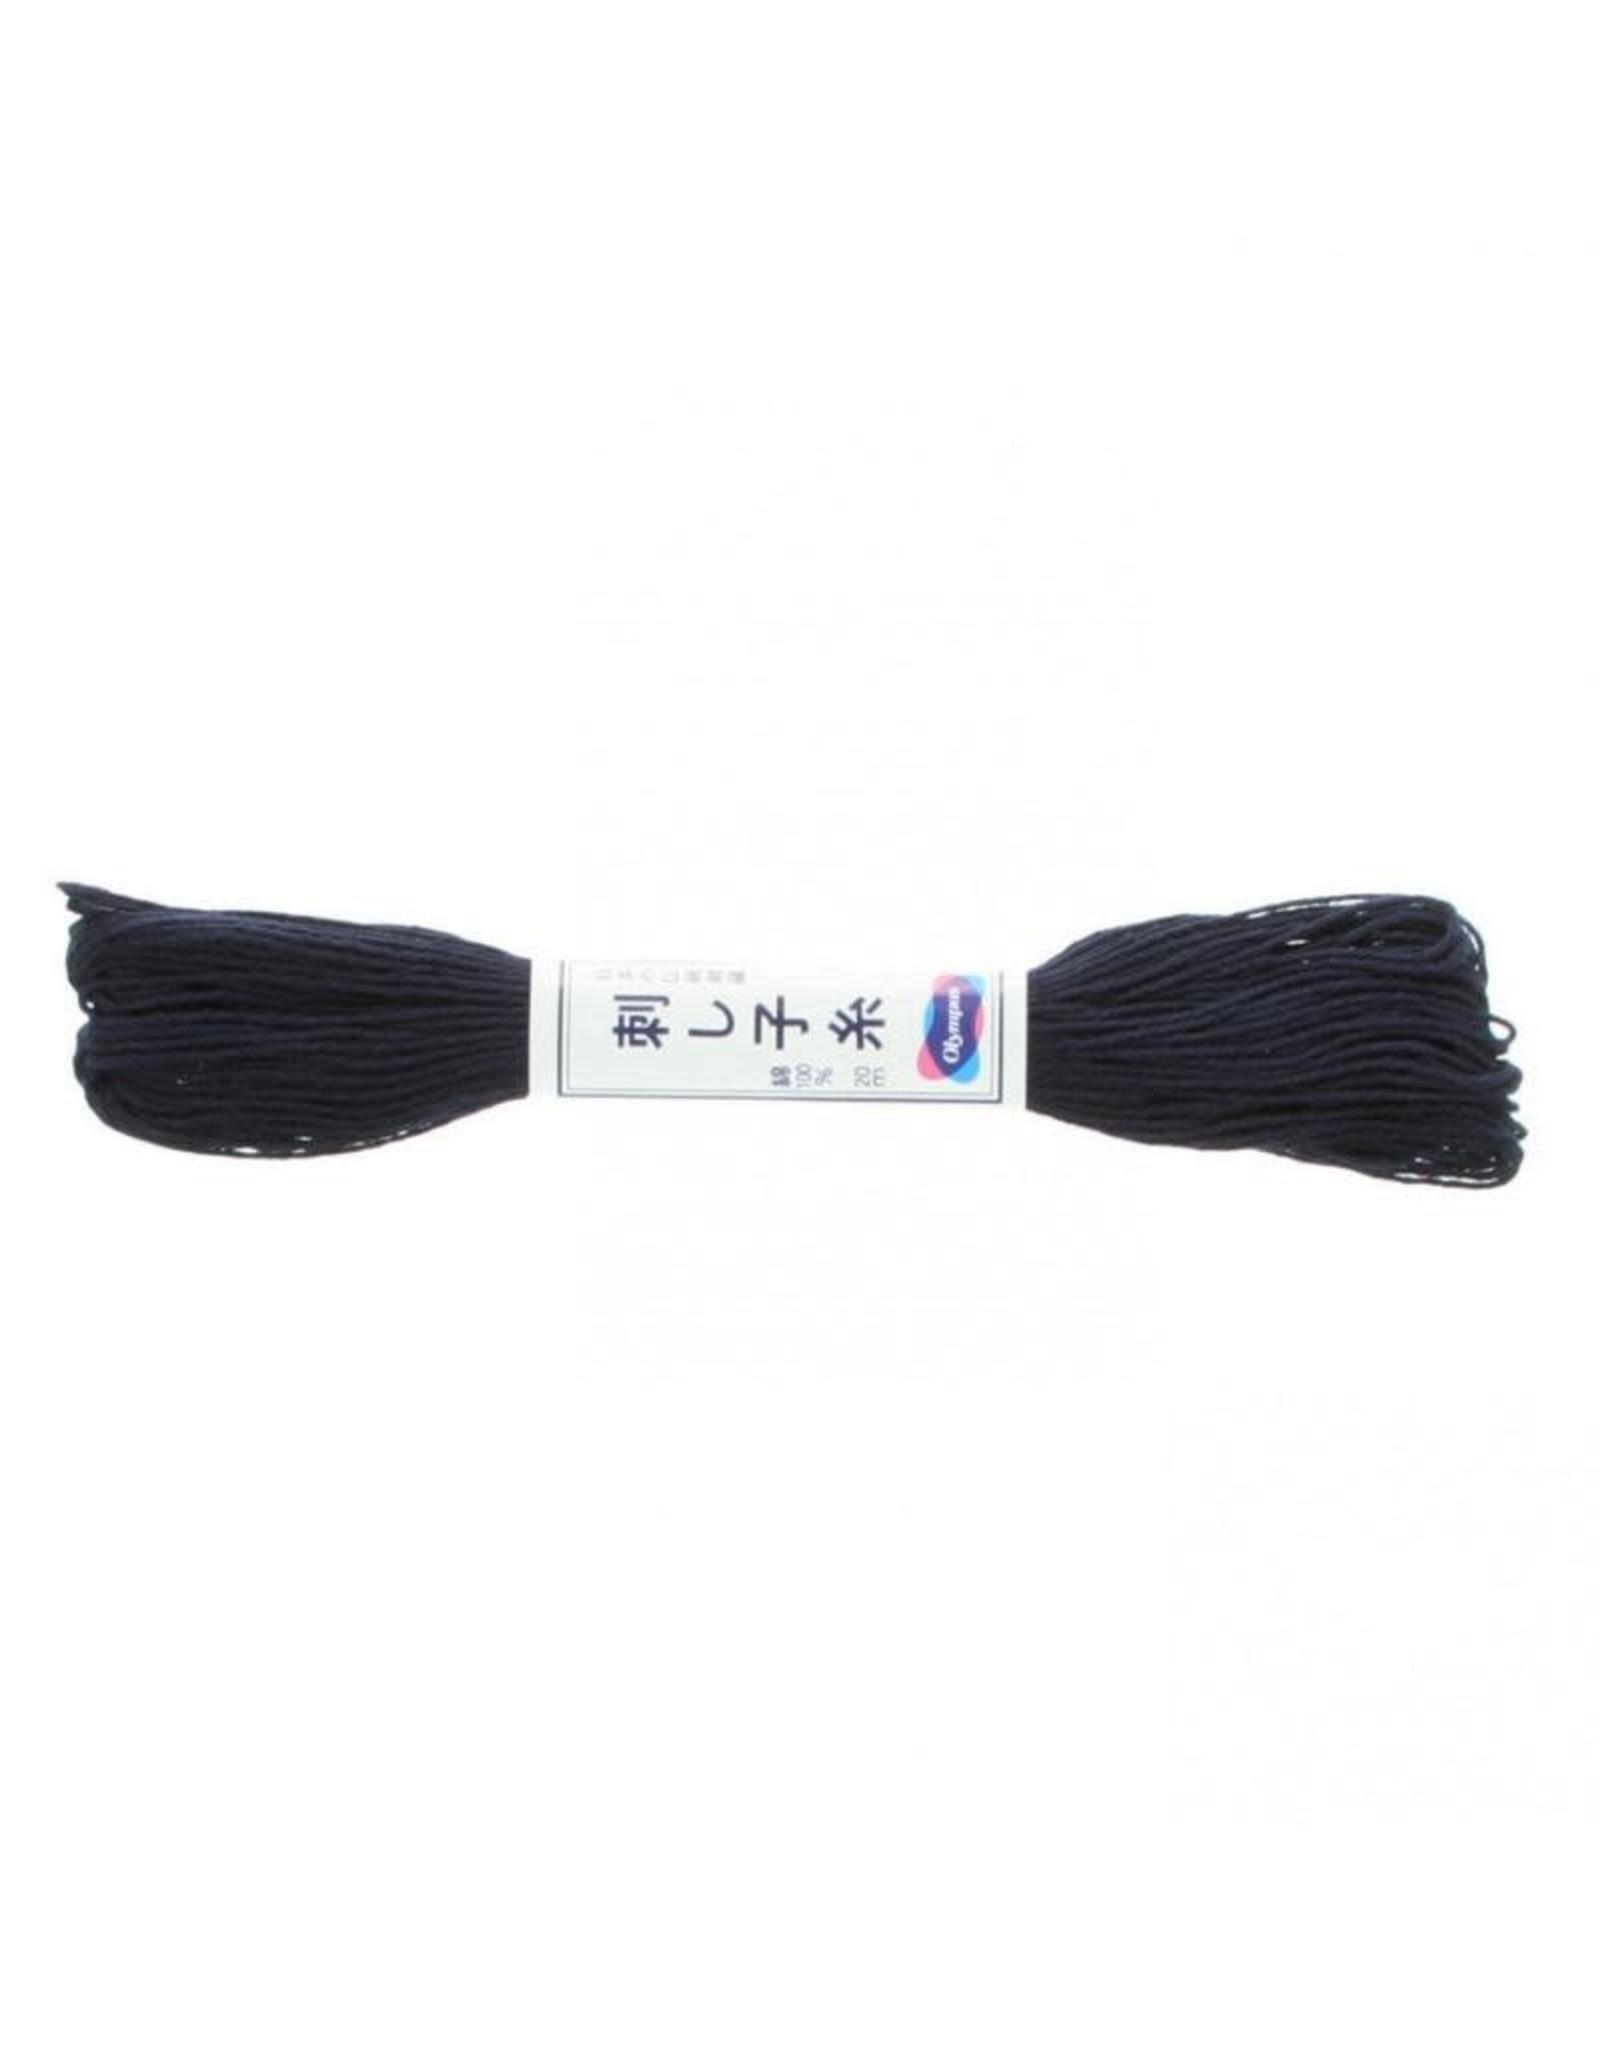 Olympus Sashiko Thread, Navy, 22 yd. skein, 100% Cotton